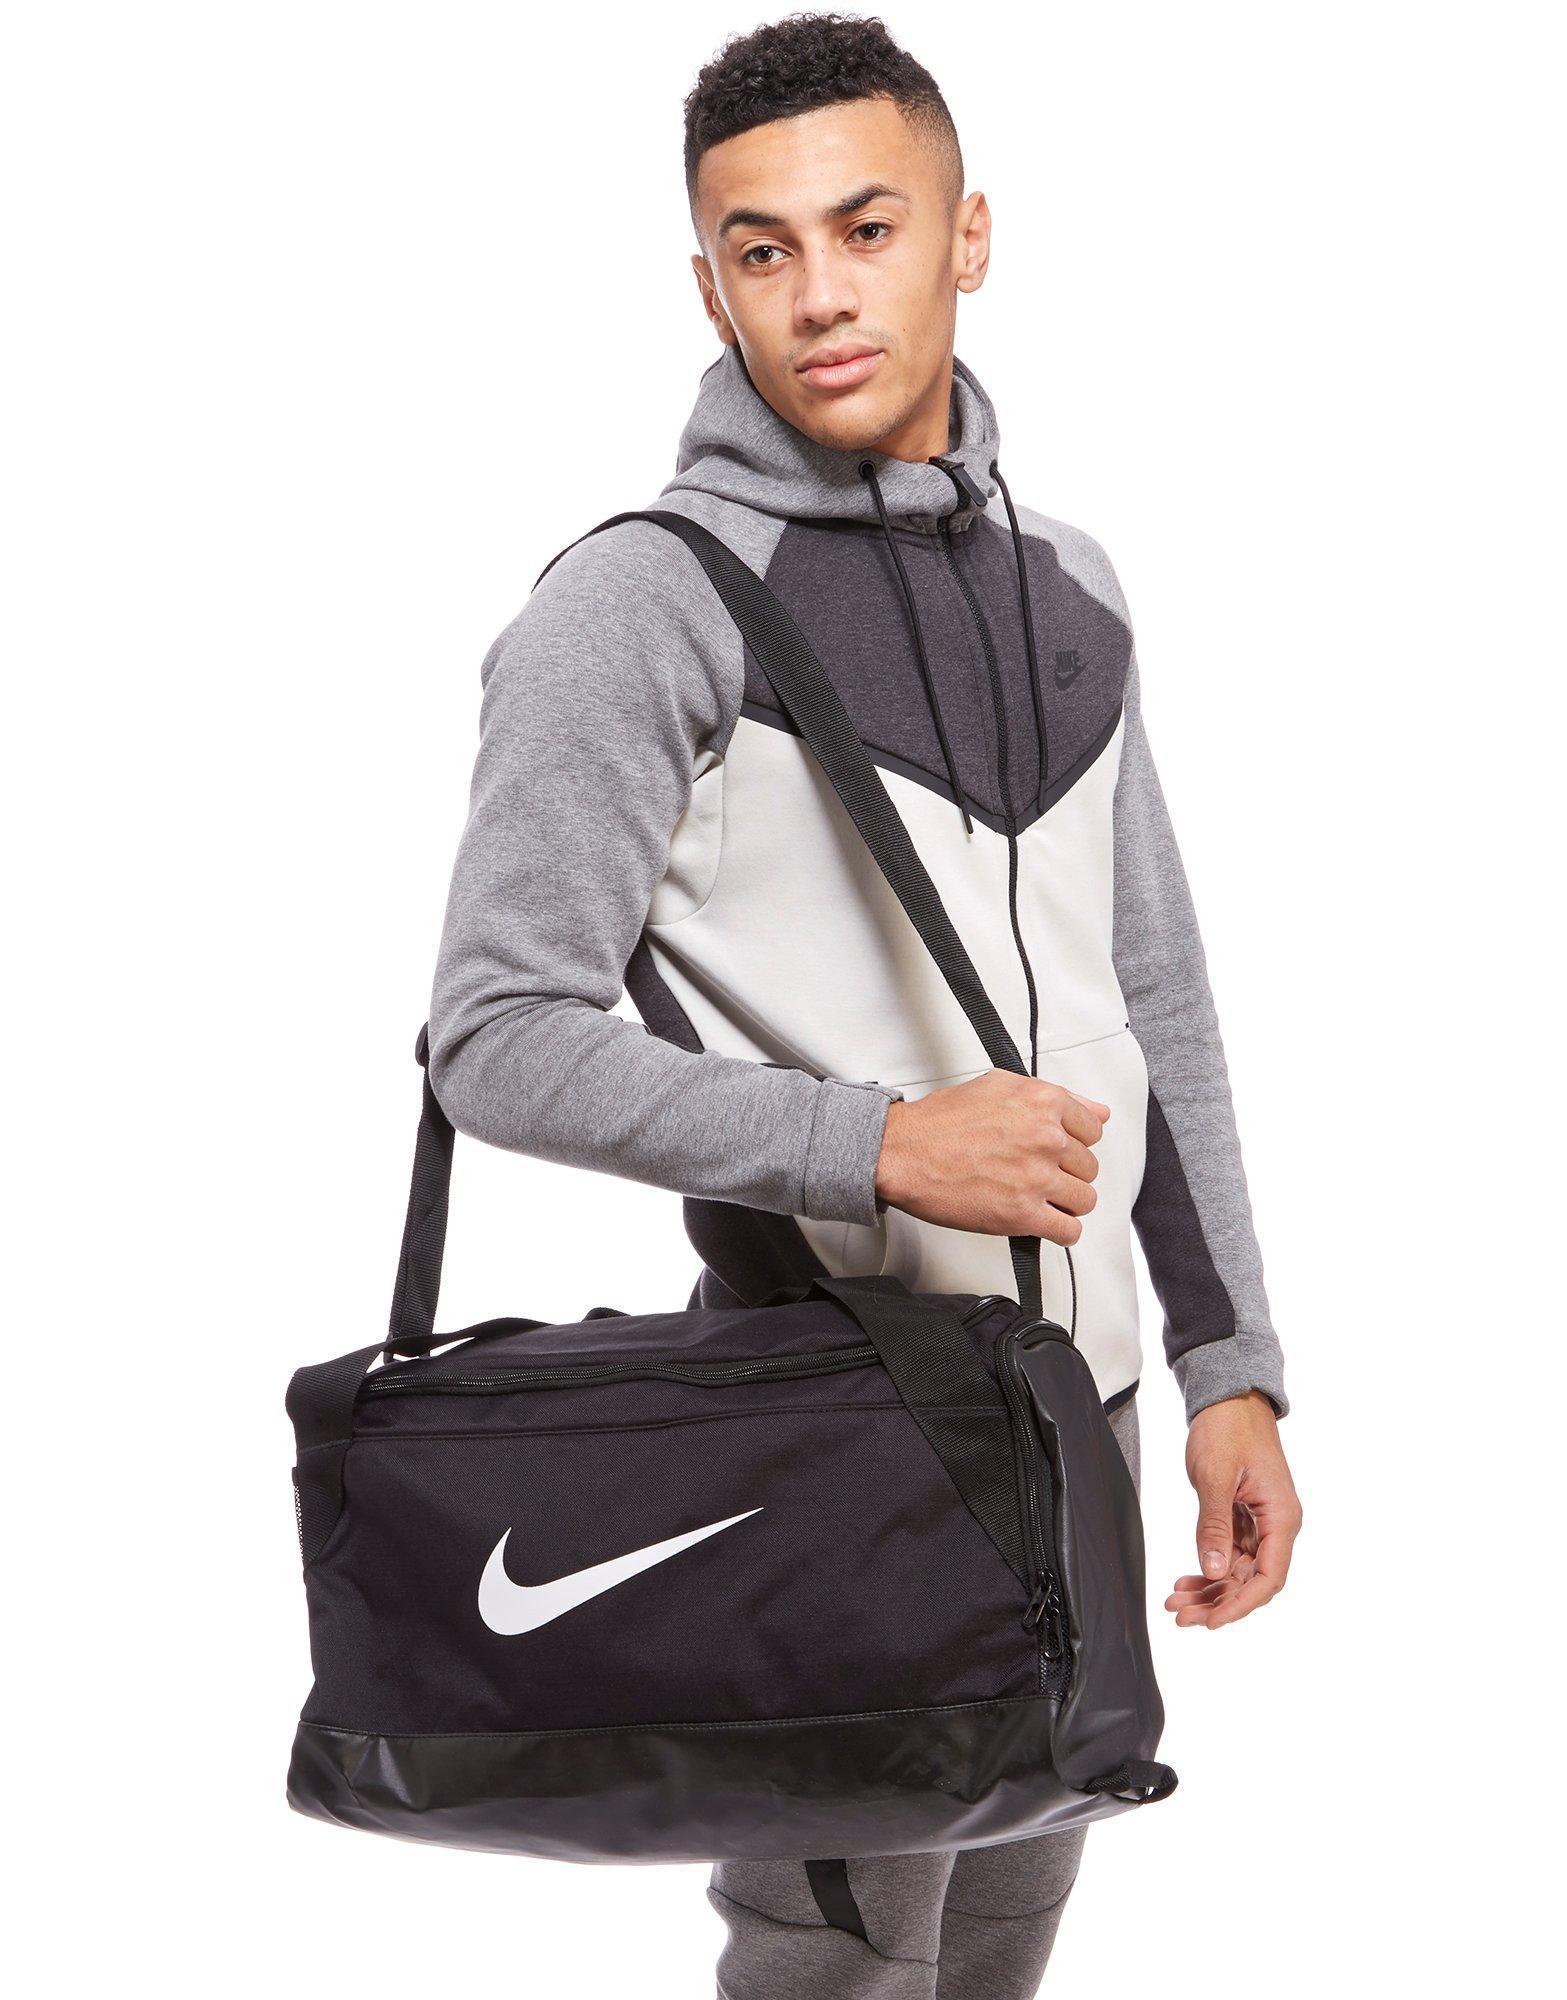 ... Lyst - Nike Brasilia Small Duffel Bag (midnight Navy black white) Duffel  Bags in ... 692fb63cd00c5